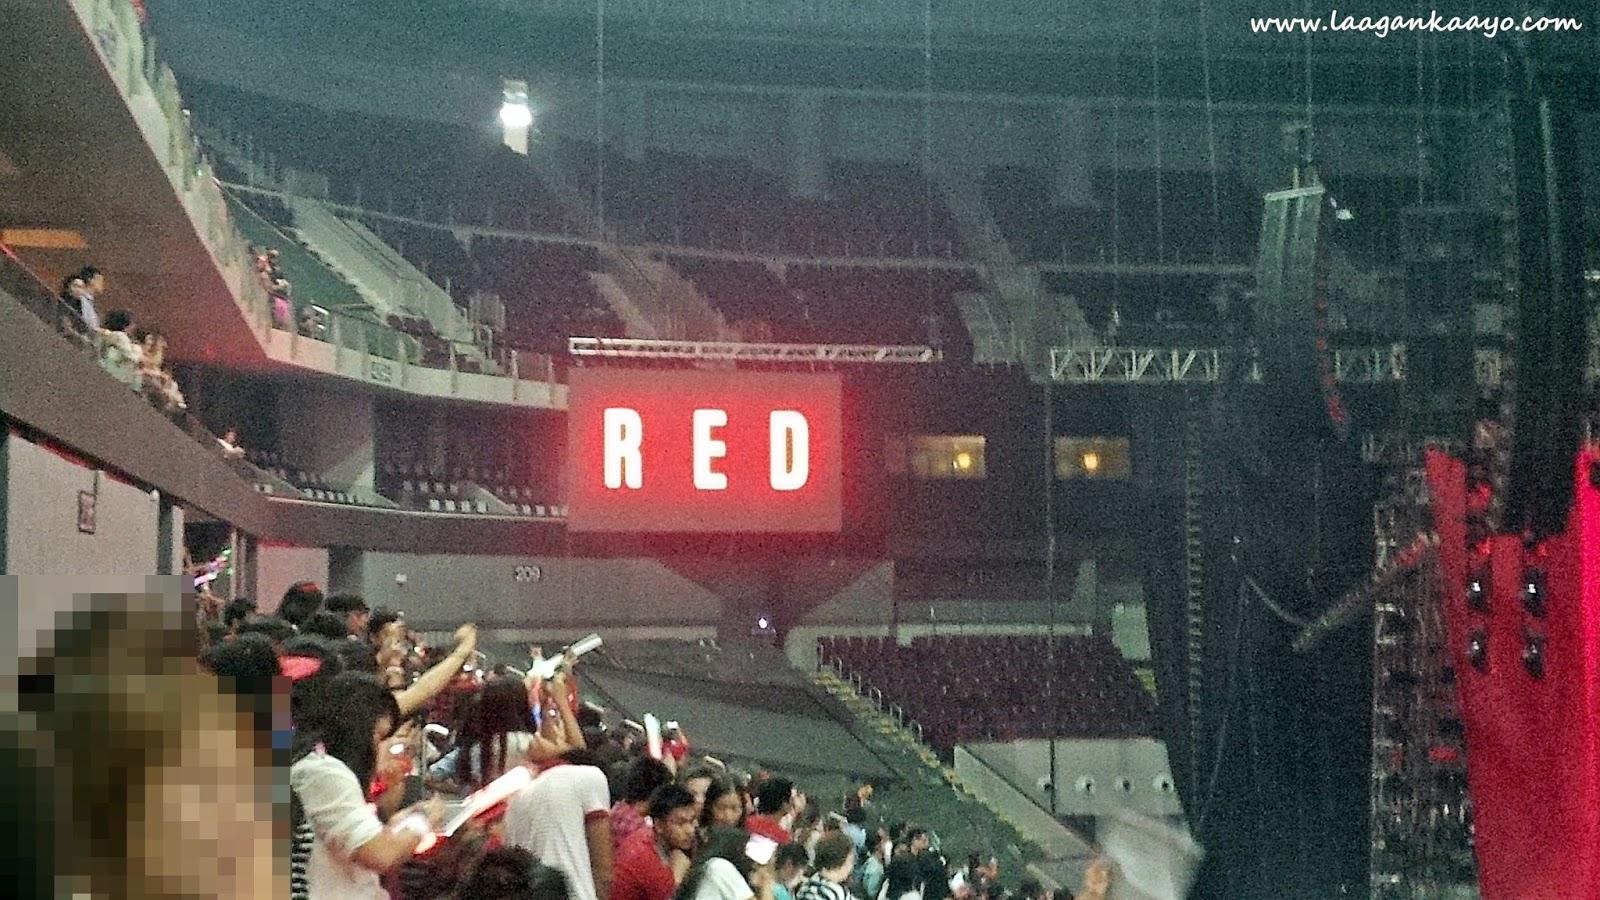 Taylor Swift Red Tour Manila – Laagan Kaayo